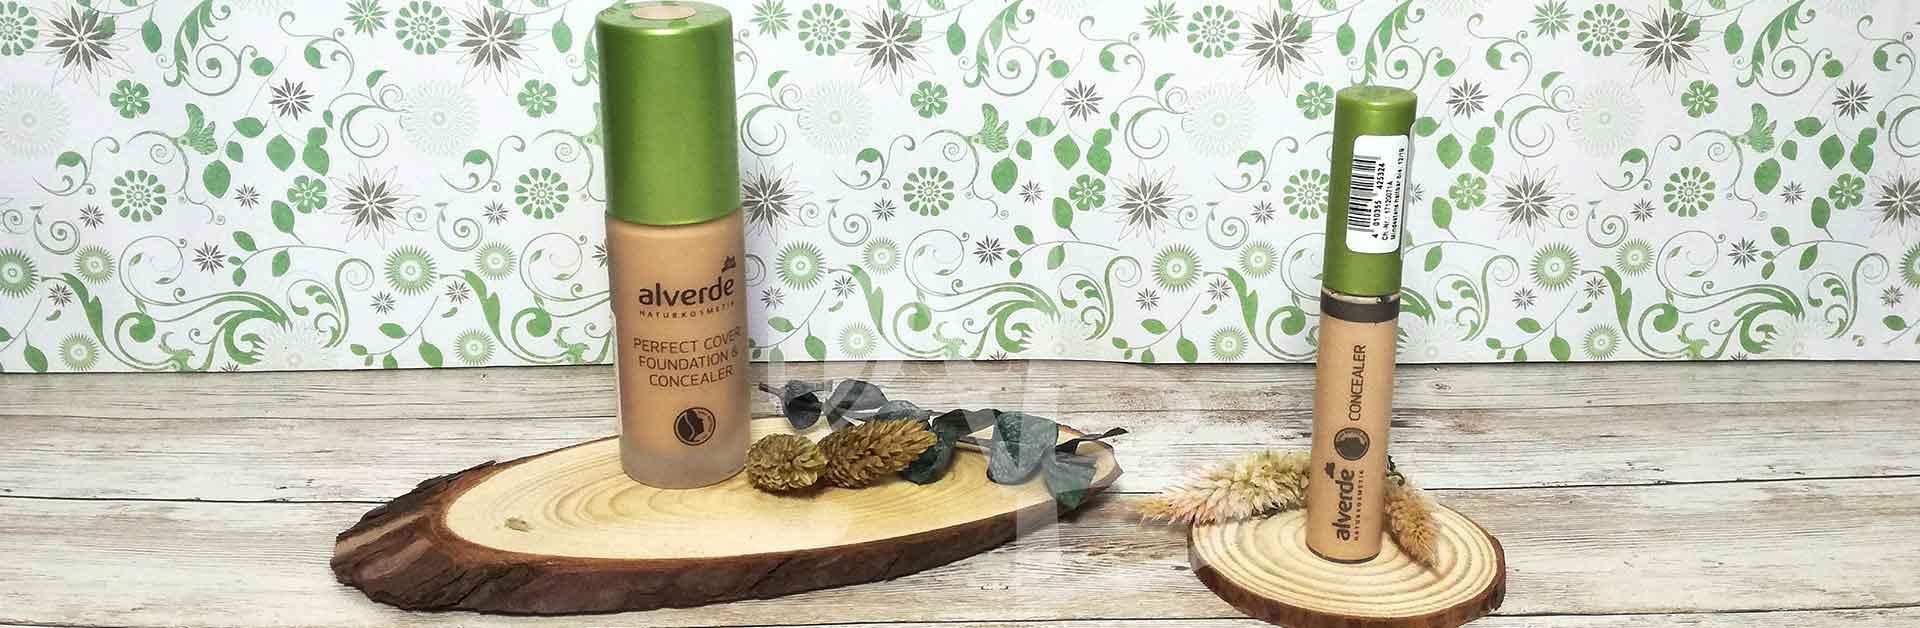 Copertina prodotti base viso Alverde